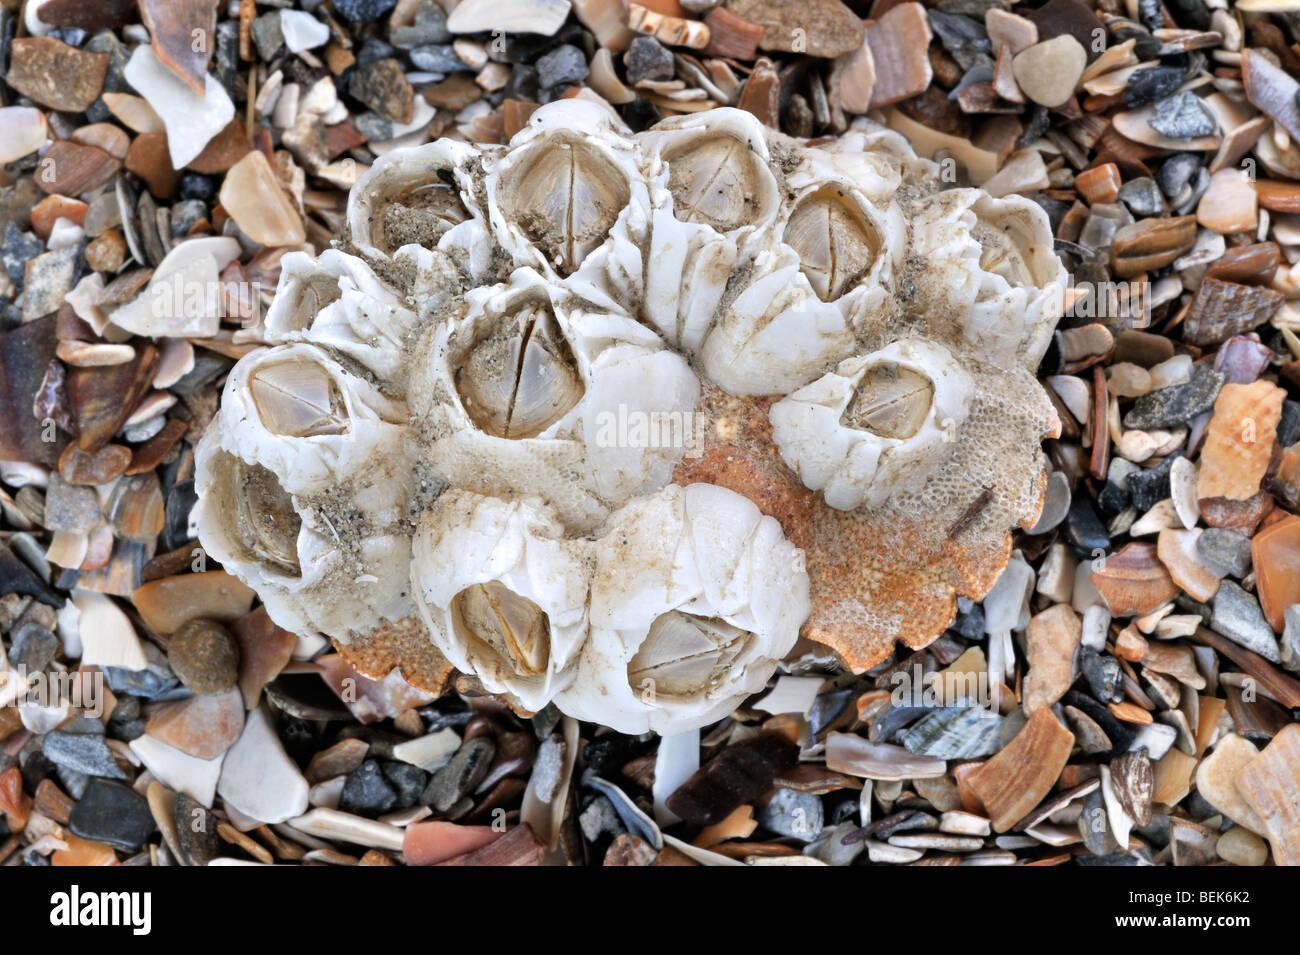 Acorn barnacles / Rock barnacles (Semibalanus balanoides) on crab's shell, Belgium Stock Photo